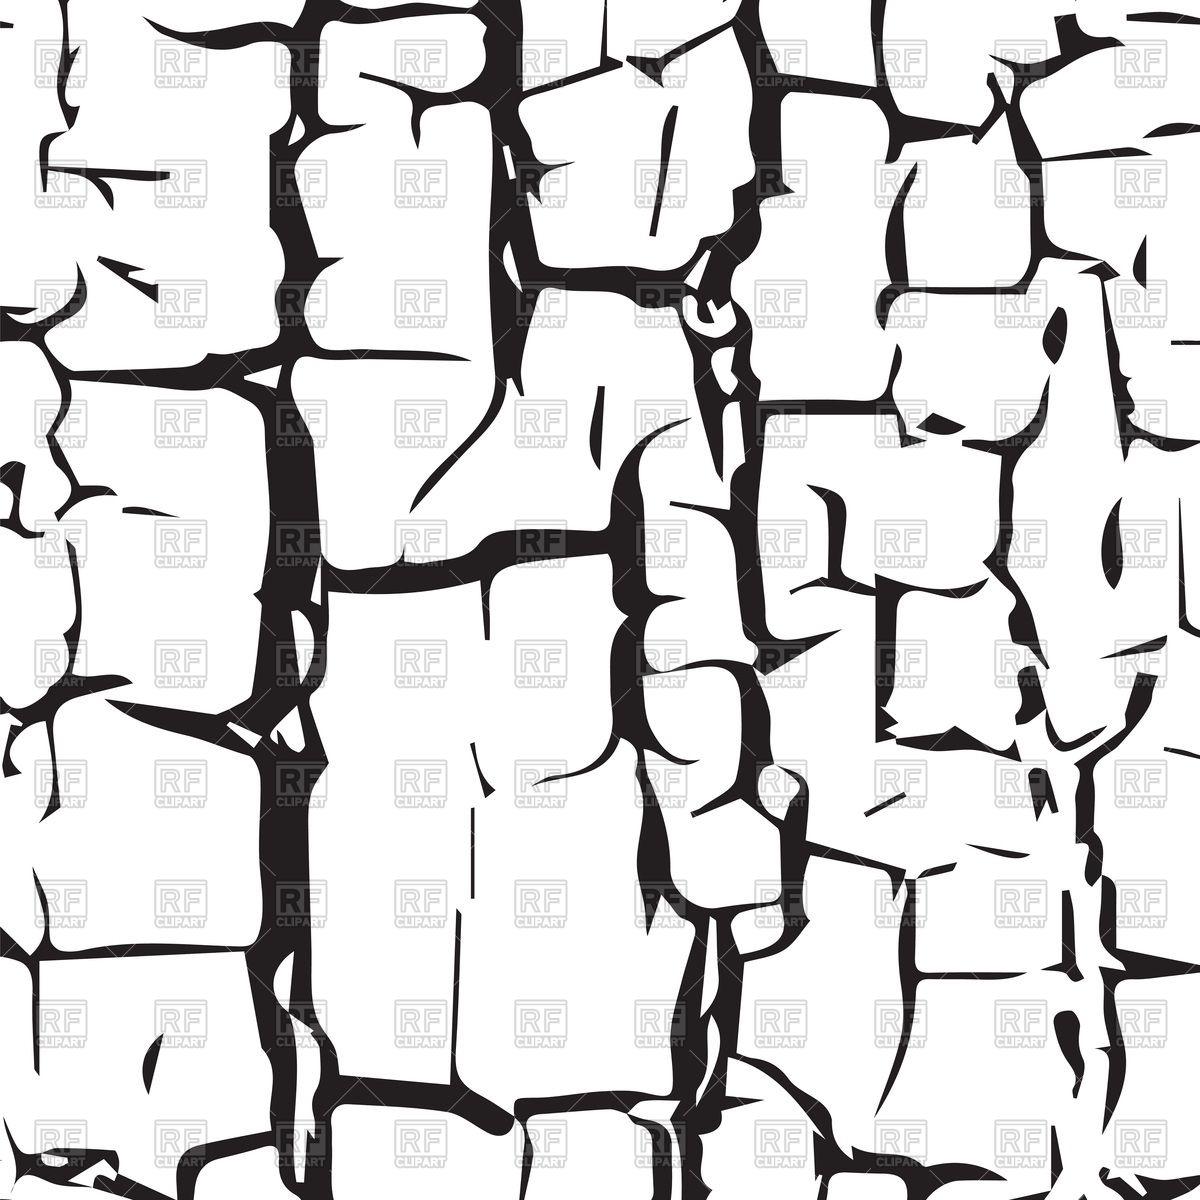 Textured clipart #13